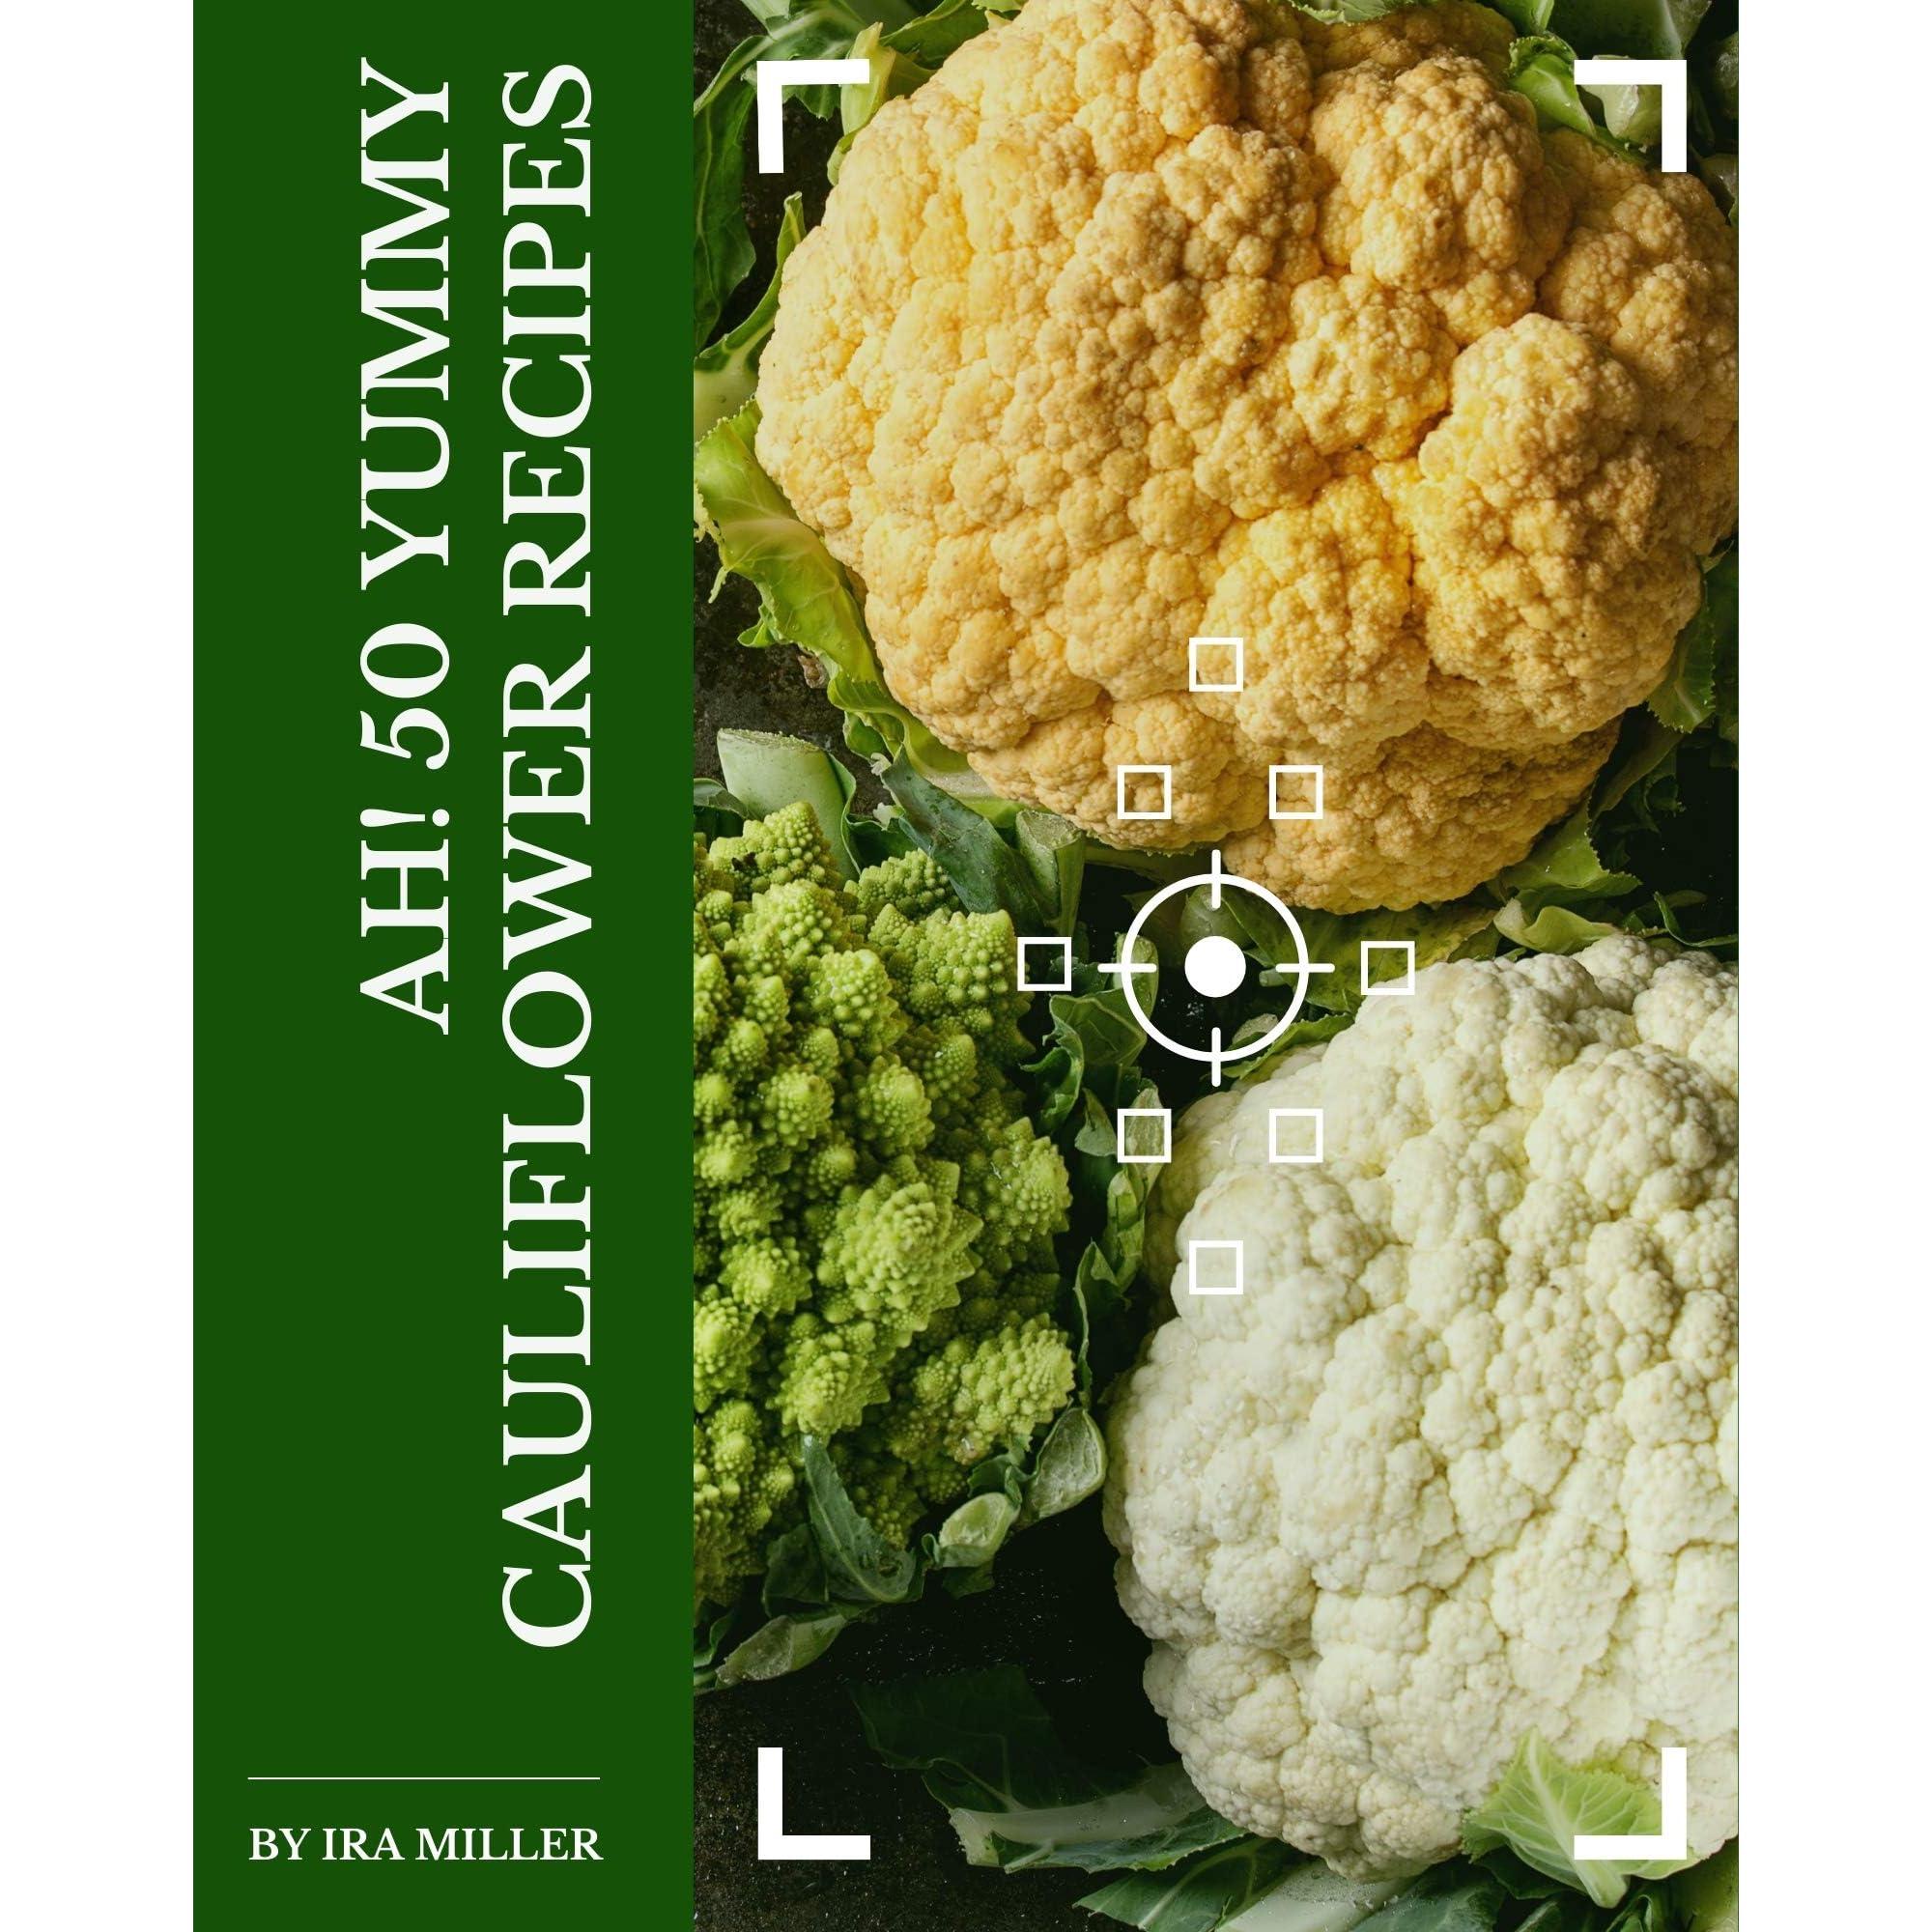 Ah 50 Yummy Cauliflower Recipes A Yummy Cauliflower Cookbook To Fall In Love With By Ira Miller